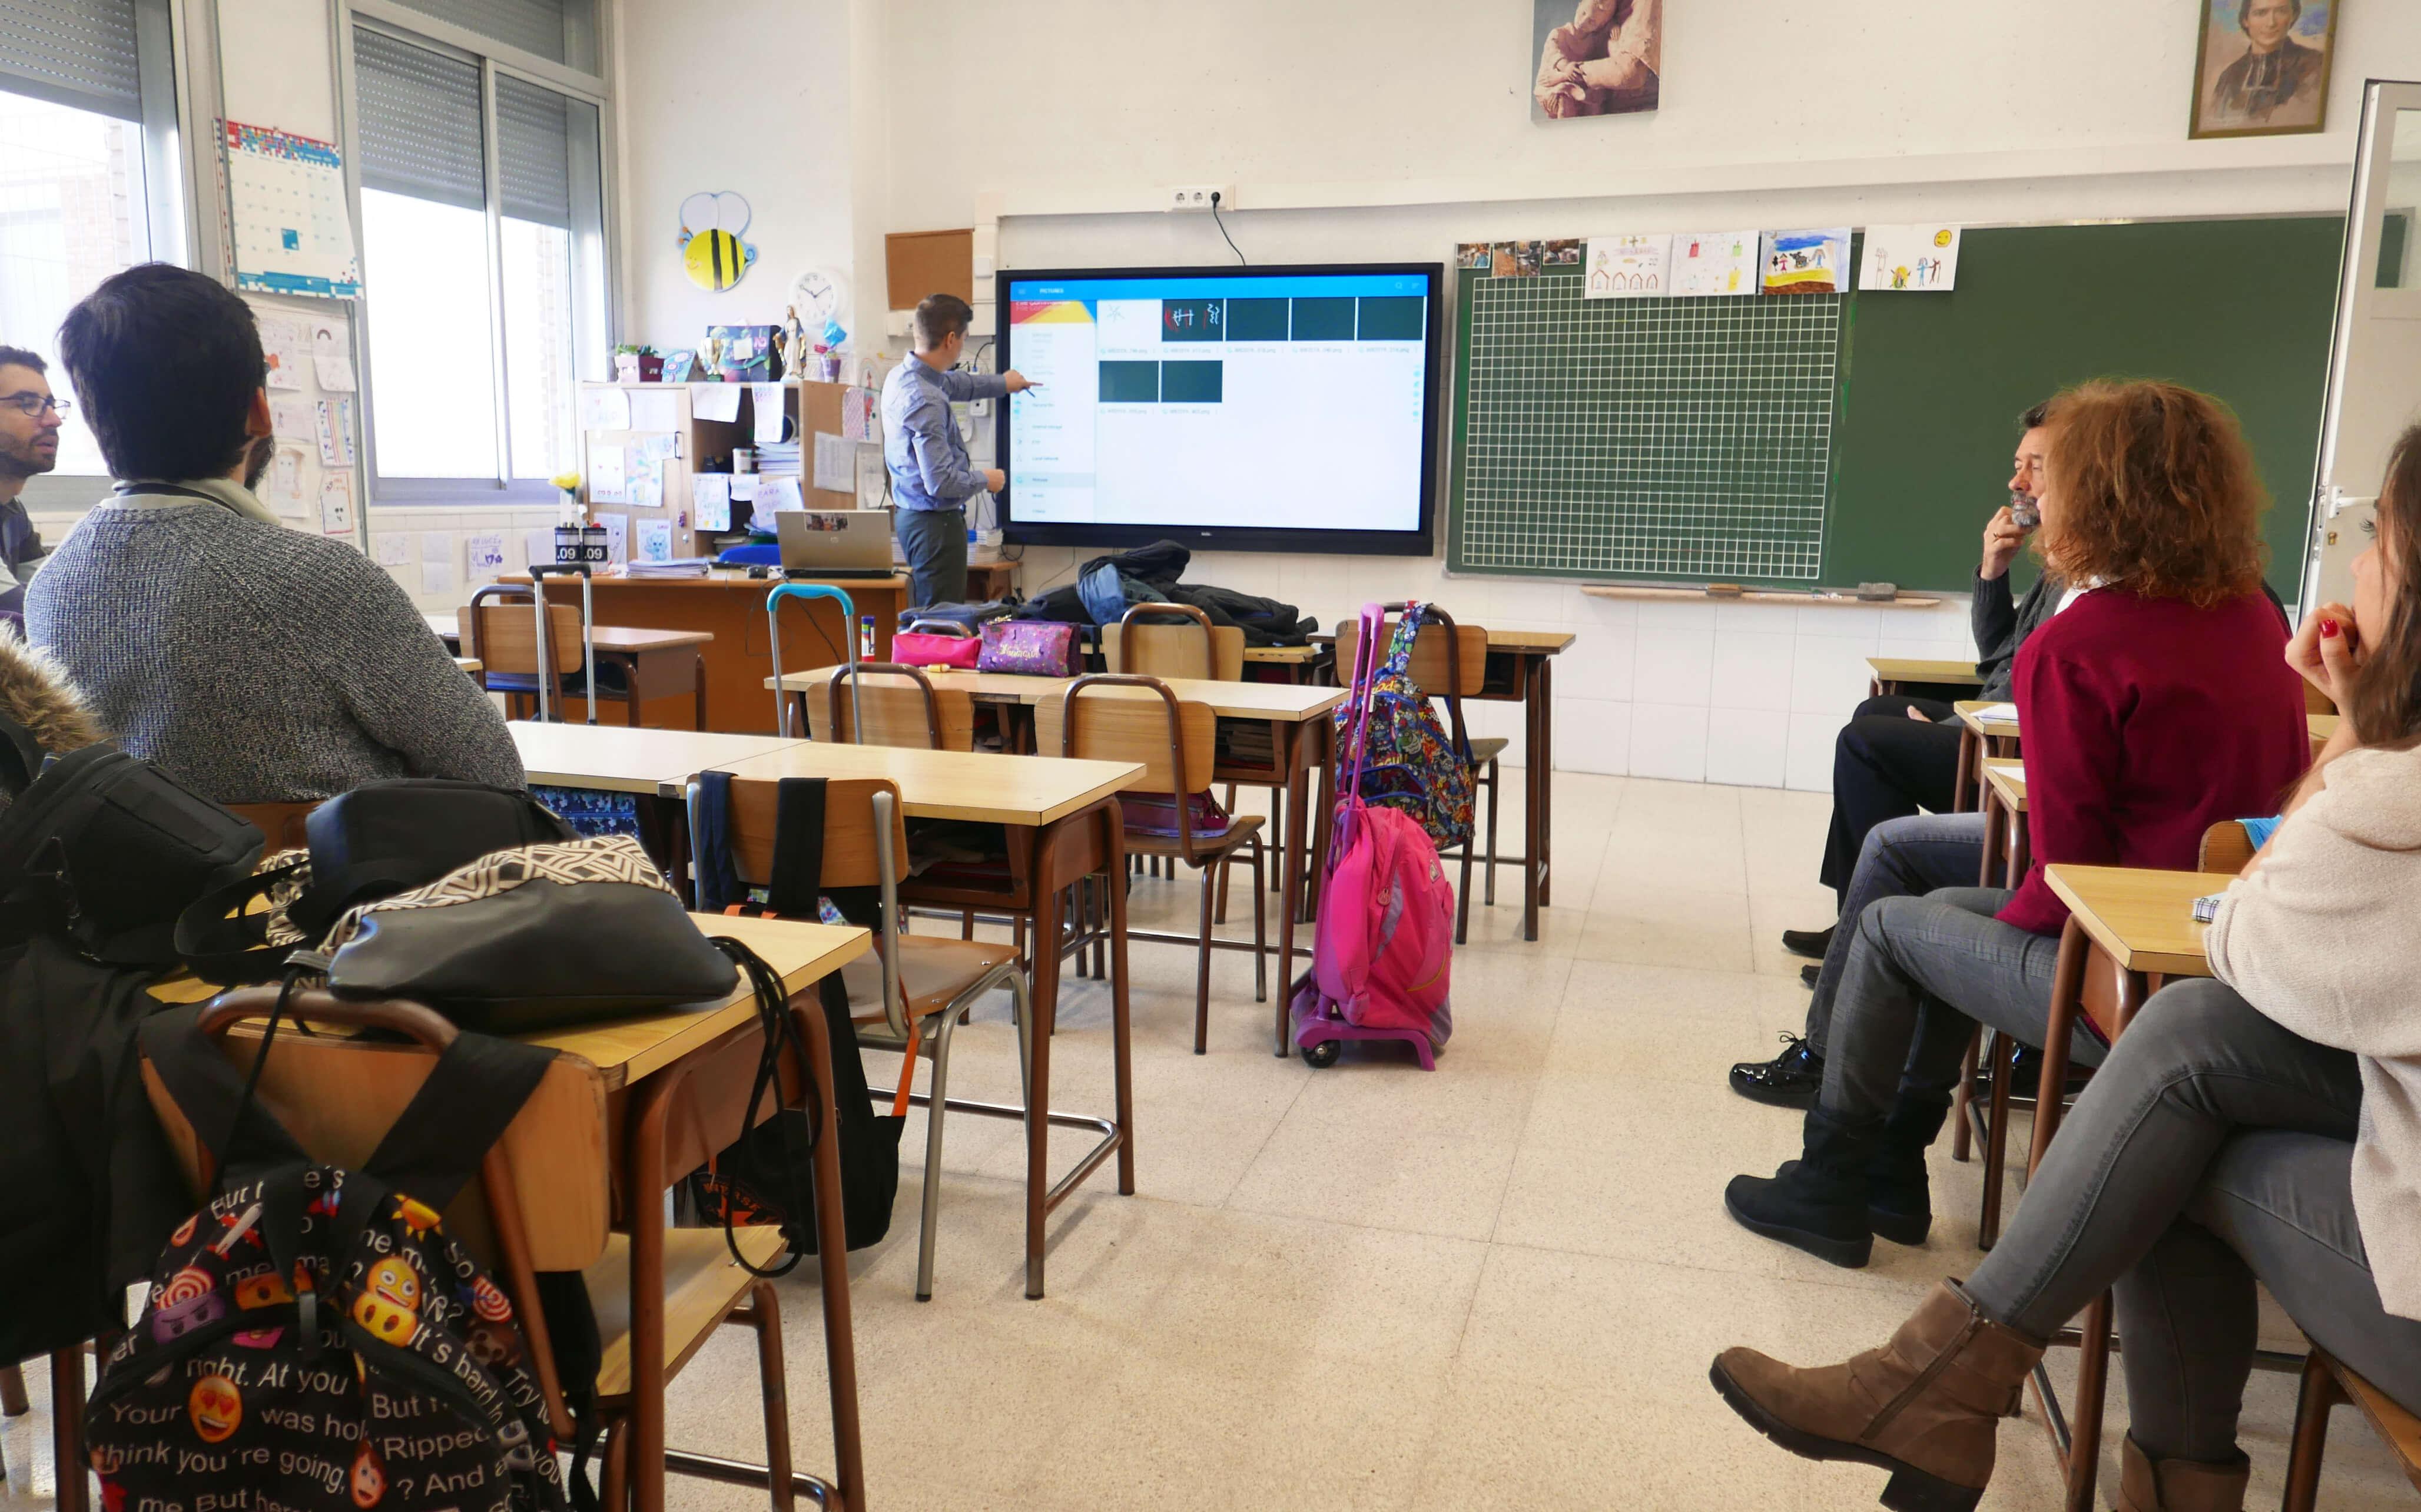 smart interative display in classroom